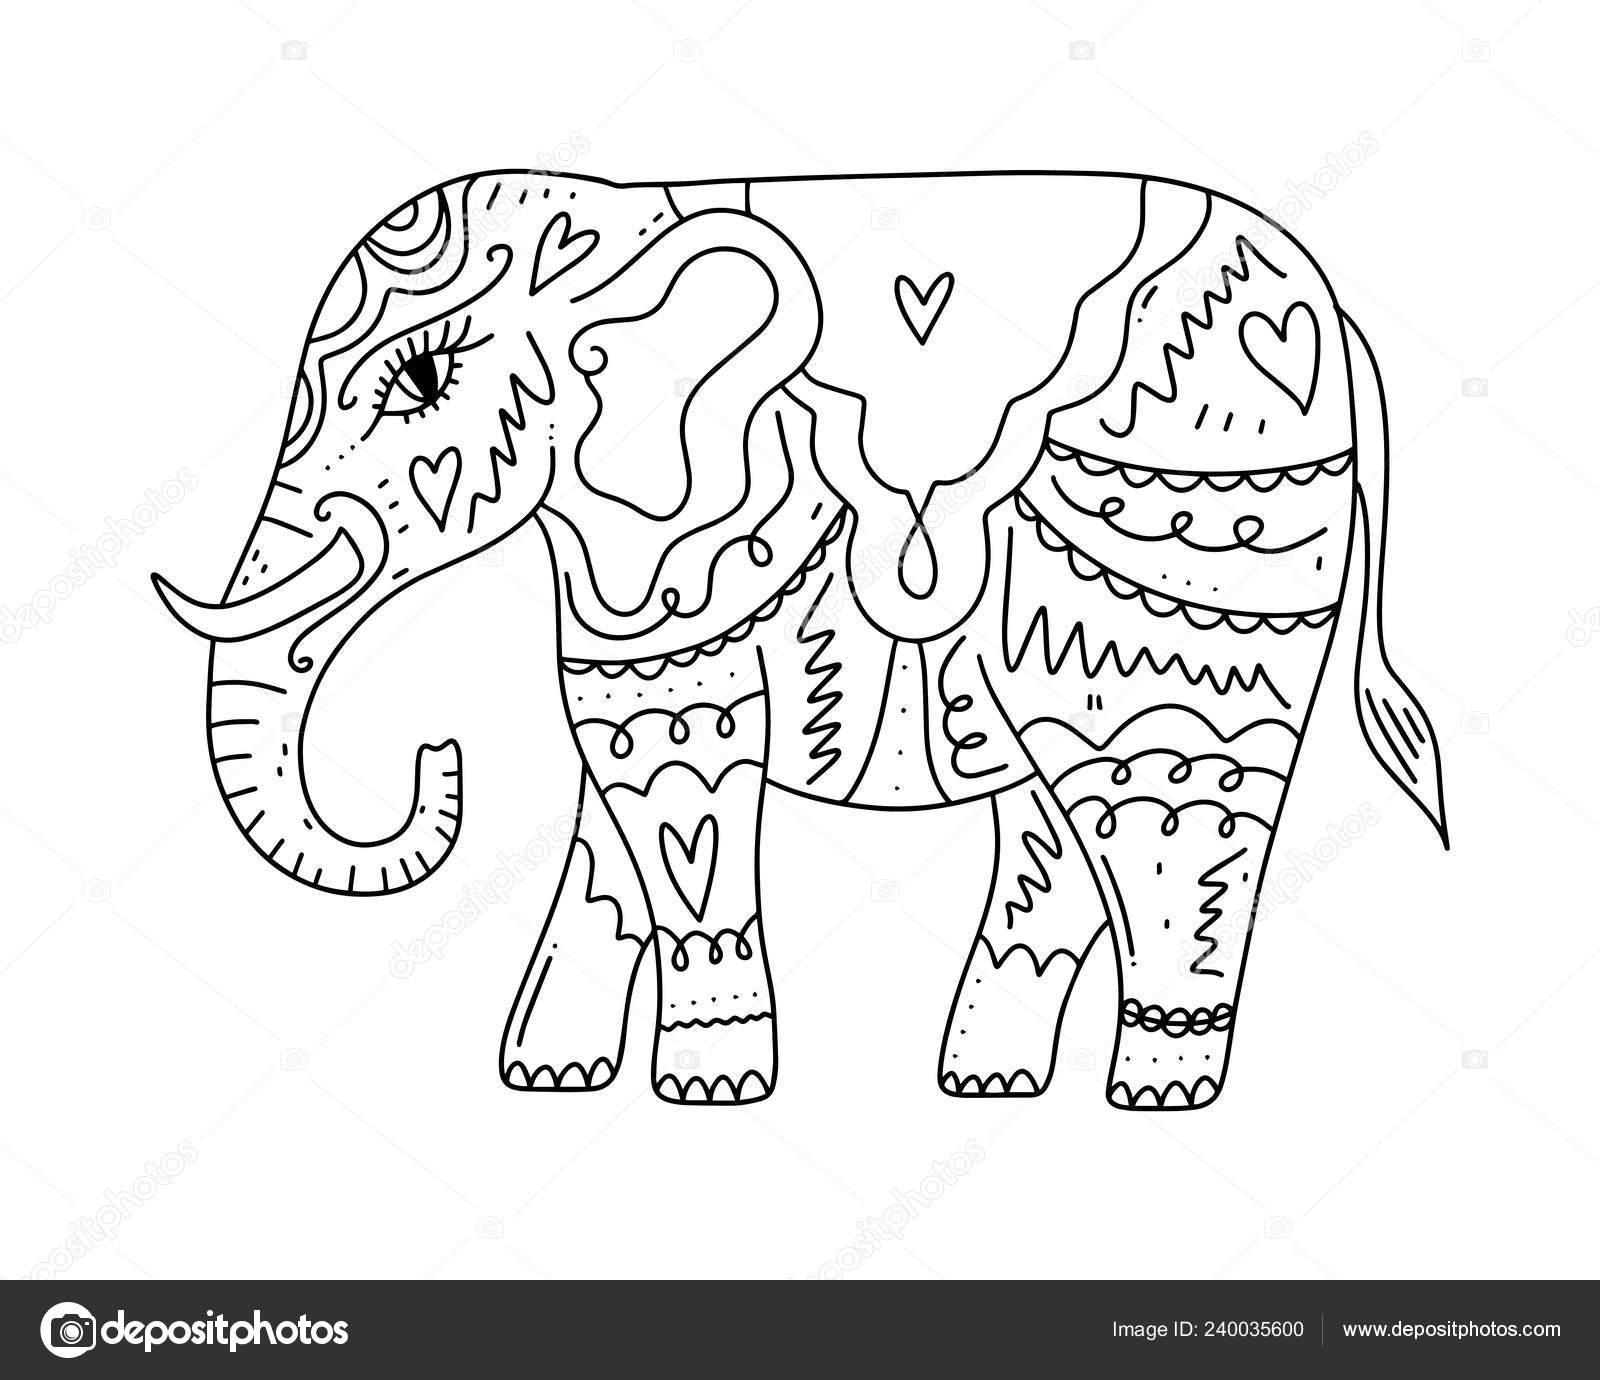 Kleurplaten Over Olifanten.Hand Getekende Boho Tribal Stijl Olifant Kleurplaat Boek